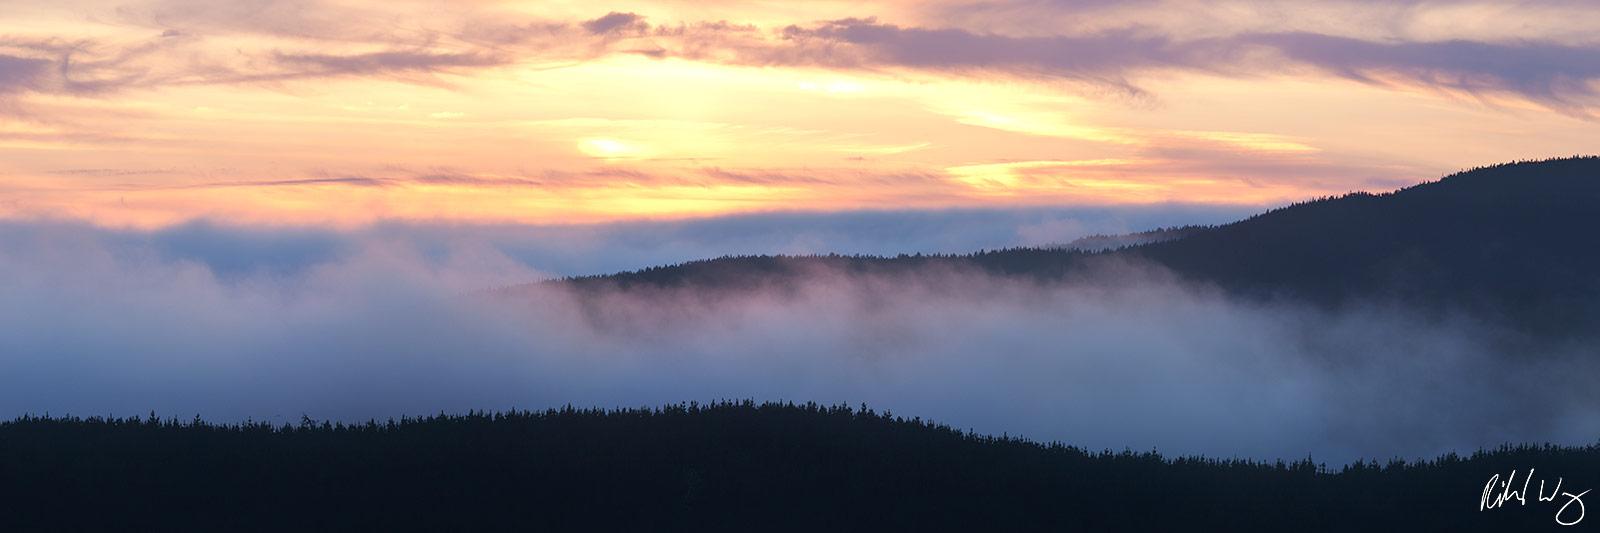 Summer Fog Rolling in Over Ridge at Sunset, Point Reyes National Seashore, California